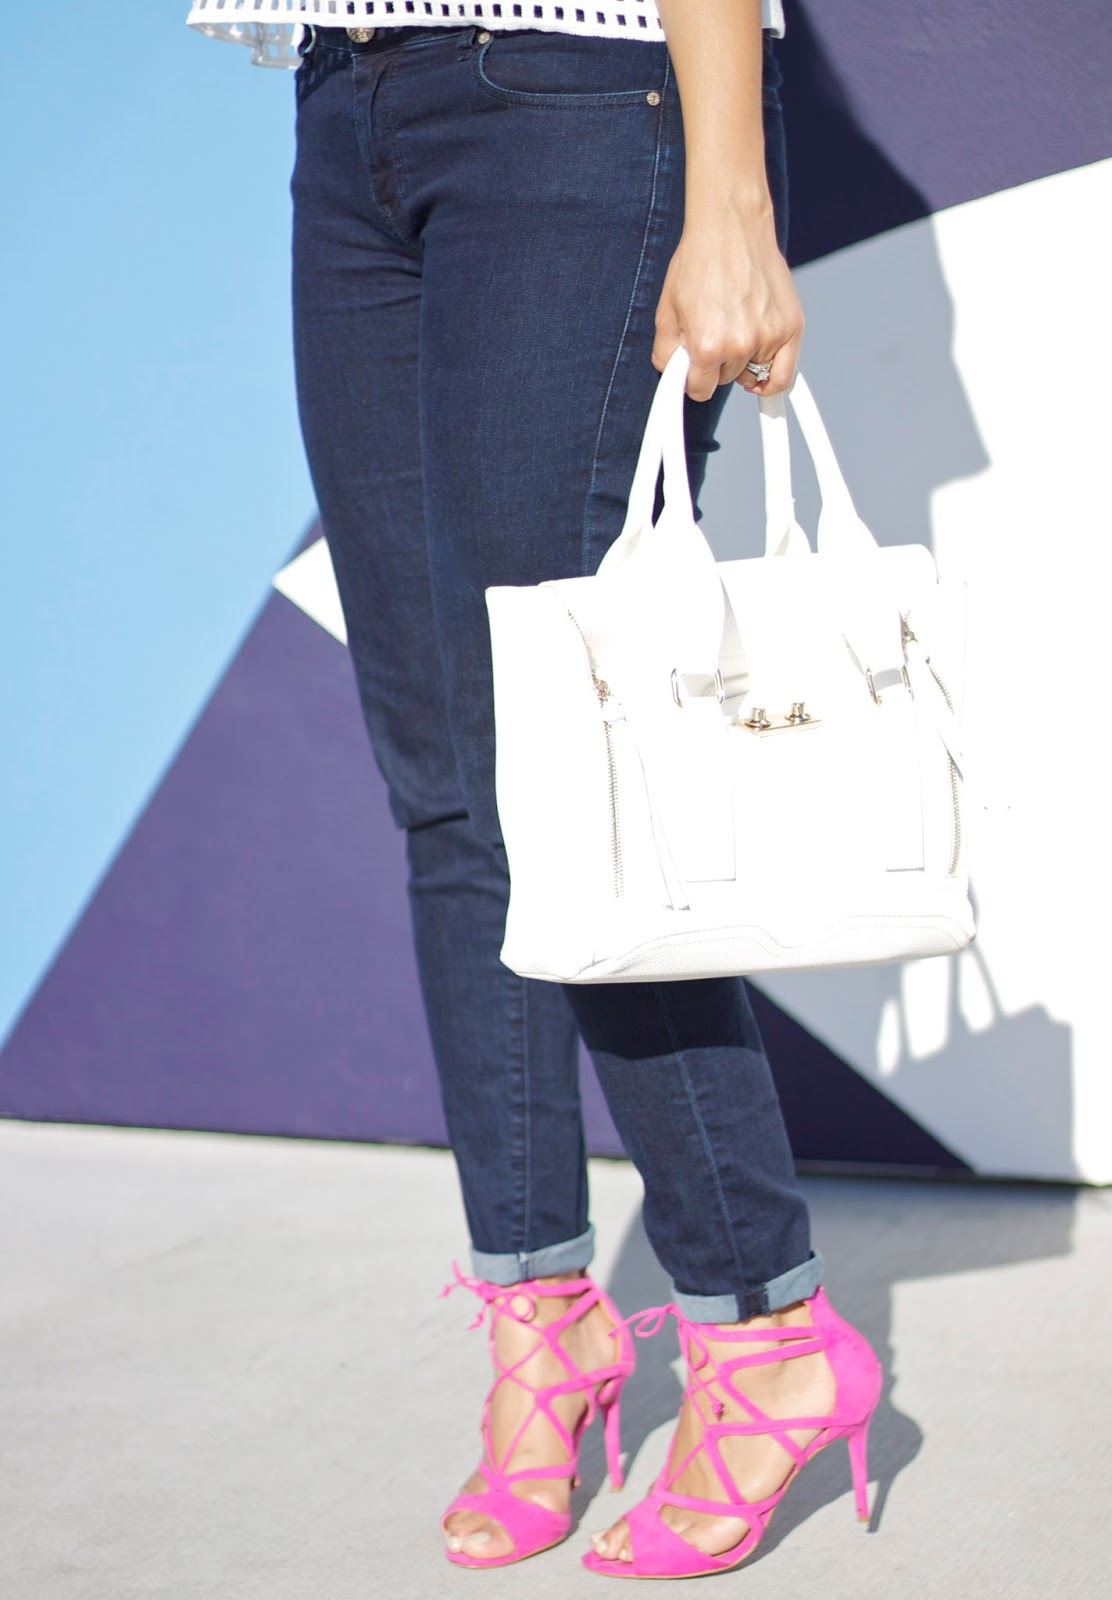 Justfab find, justfab hot pink lace up heels, hot pink lace up heels, how to wear pink shoes, 3.1 phillip lim white pashli